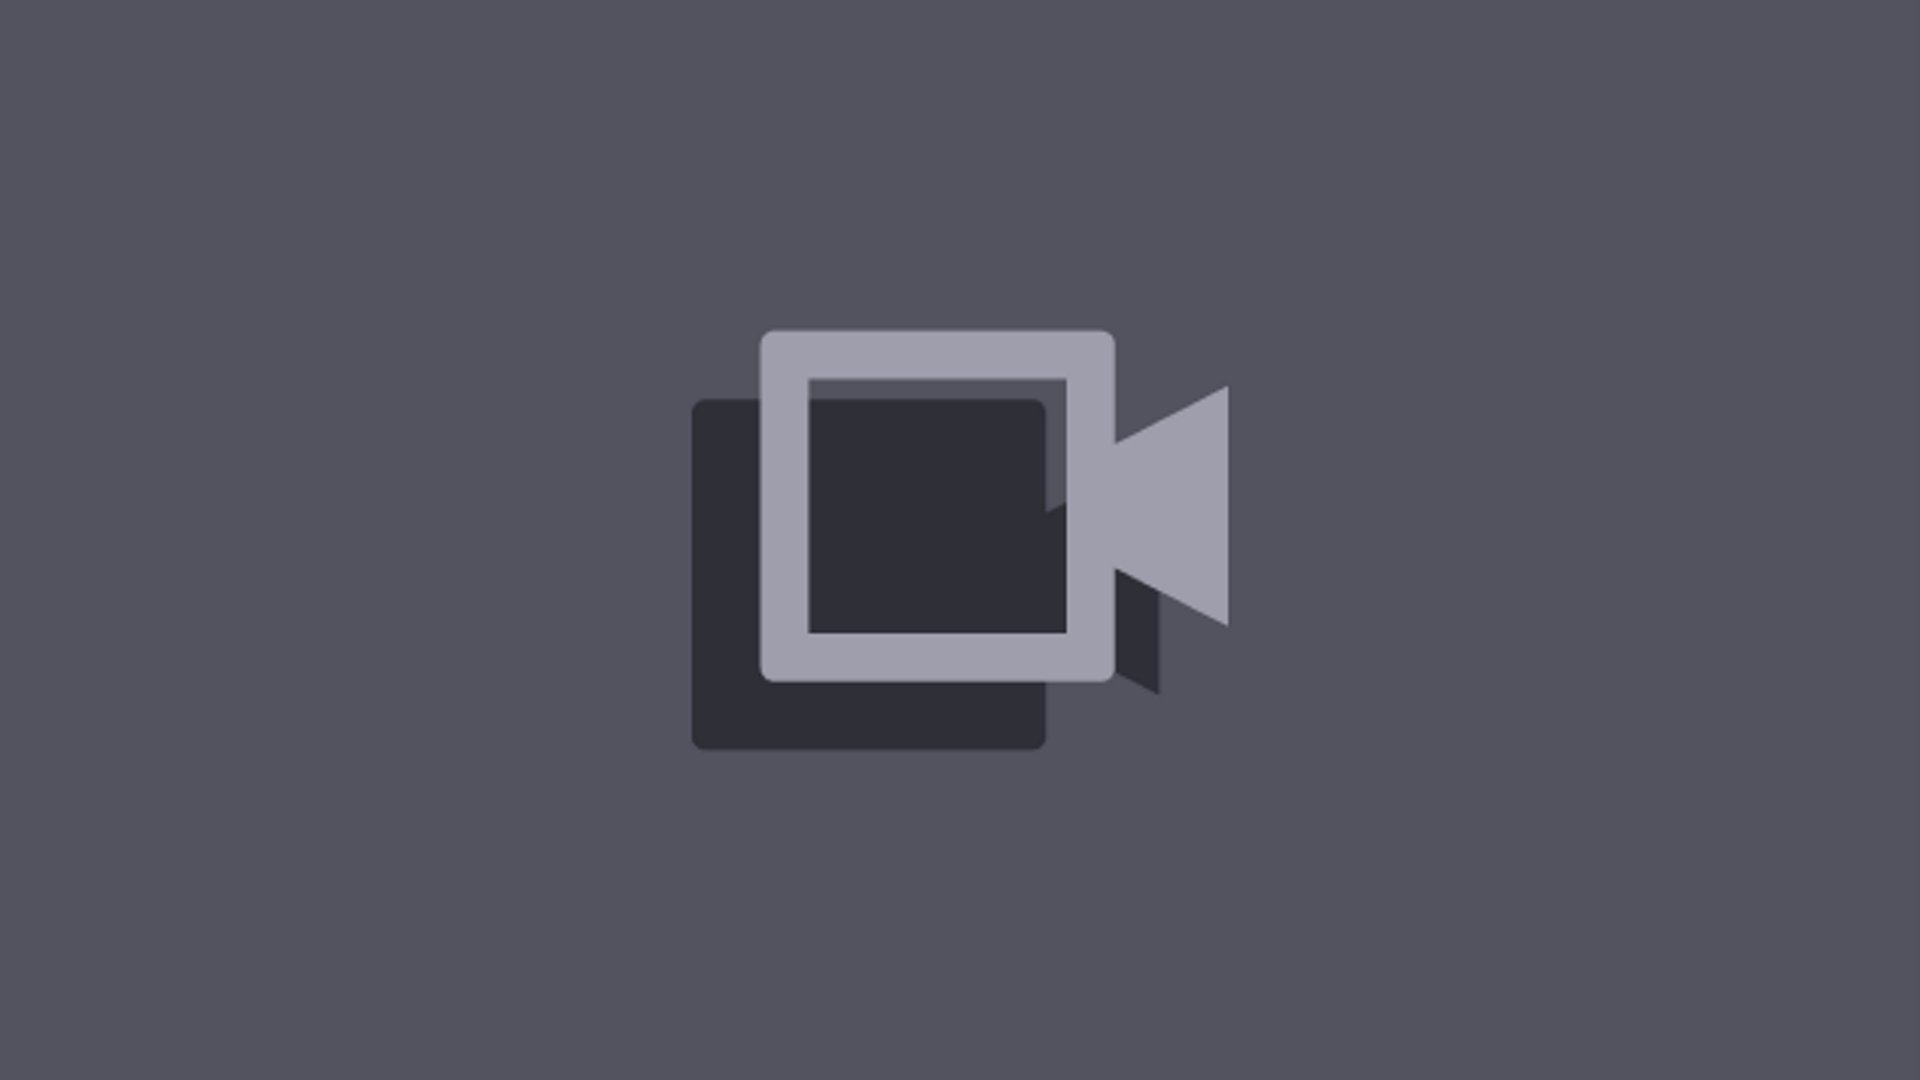 ggdeadheart video banner